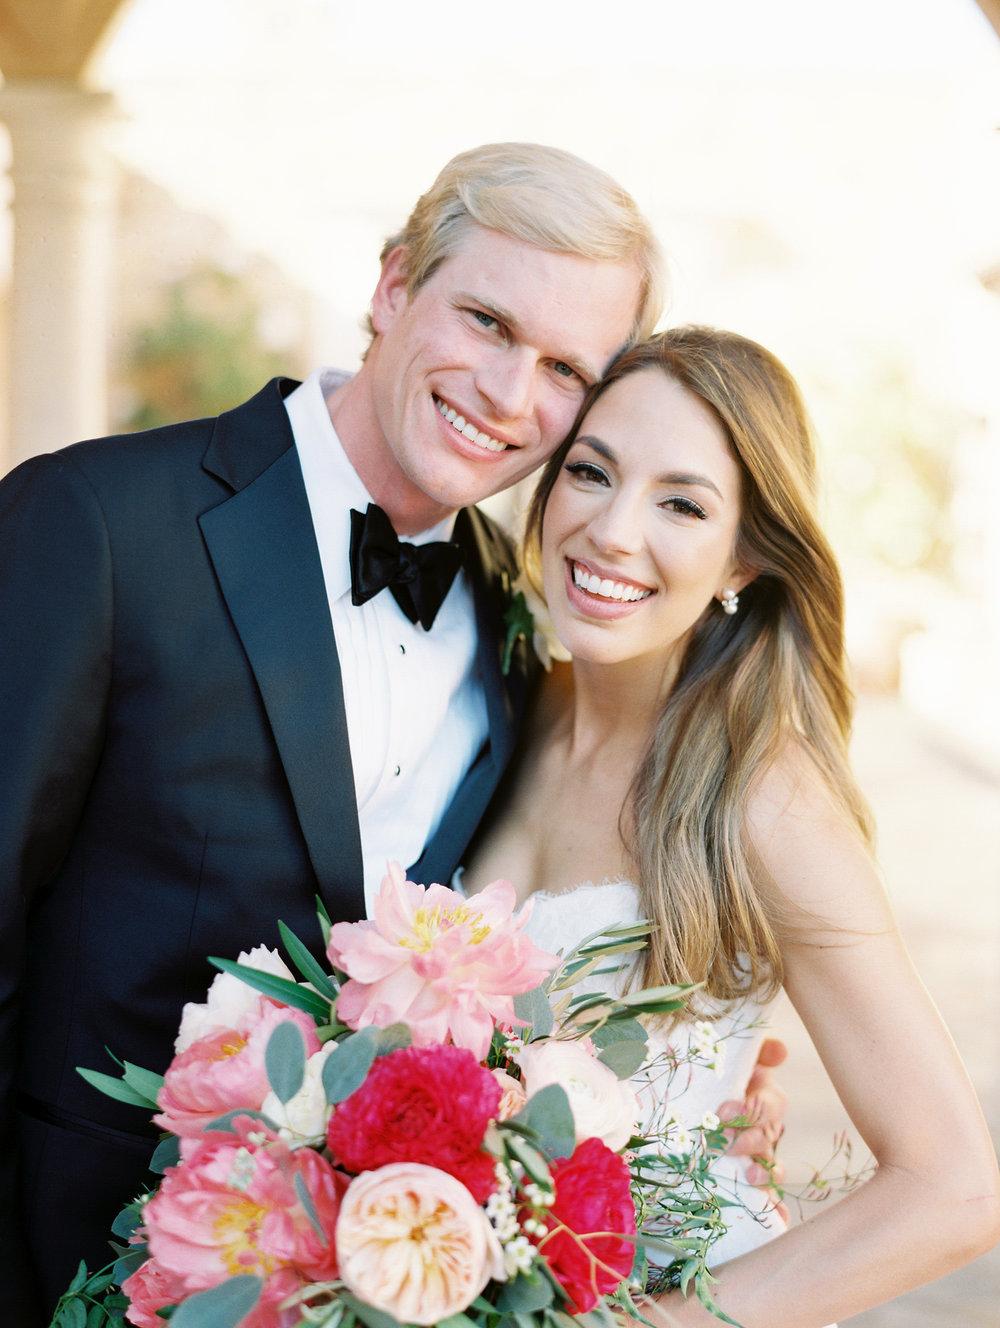 Escondido-Golf_Lake-Club-Hill-Country-Houston-Wedding-Photographer-Best-Top-Luxury-Destination-Engagements-Portrait-Austin-Photography-4.jpg